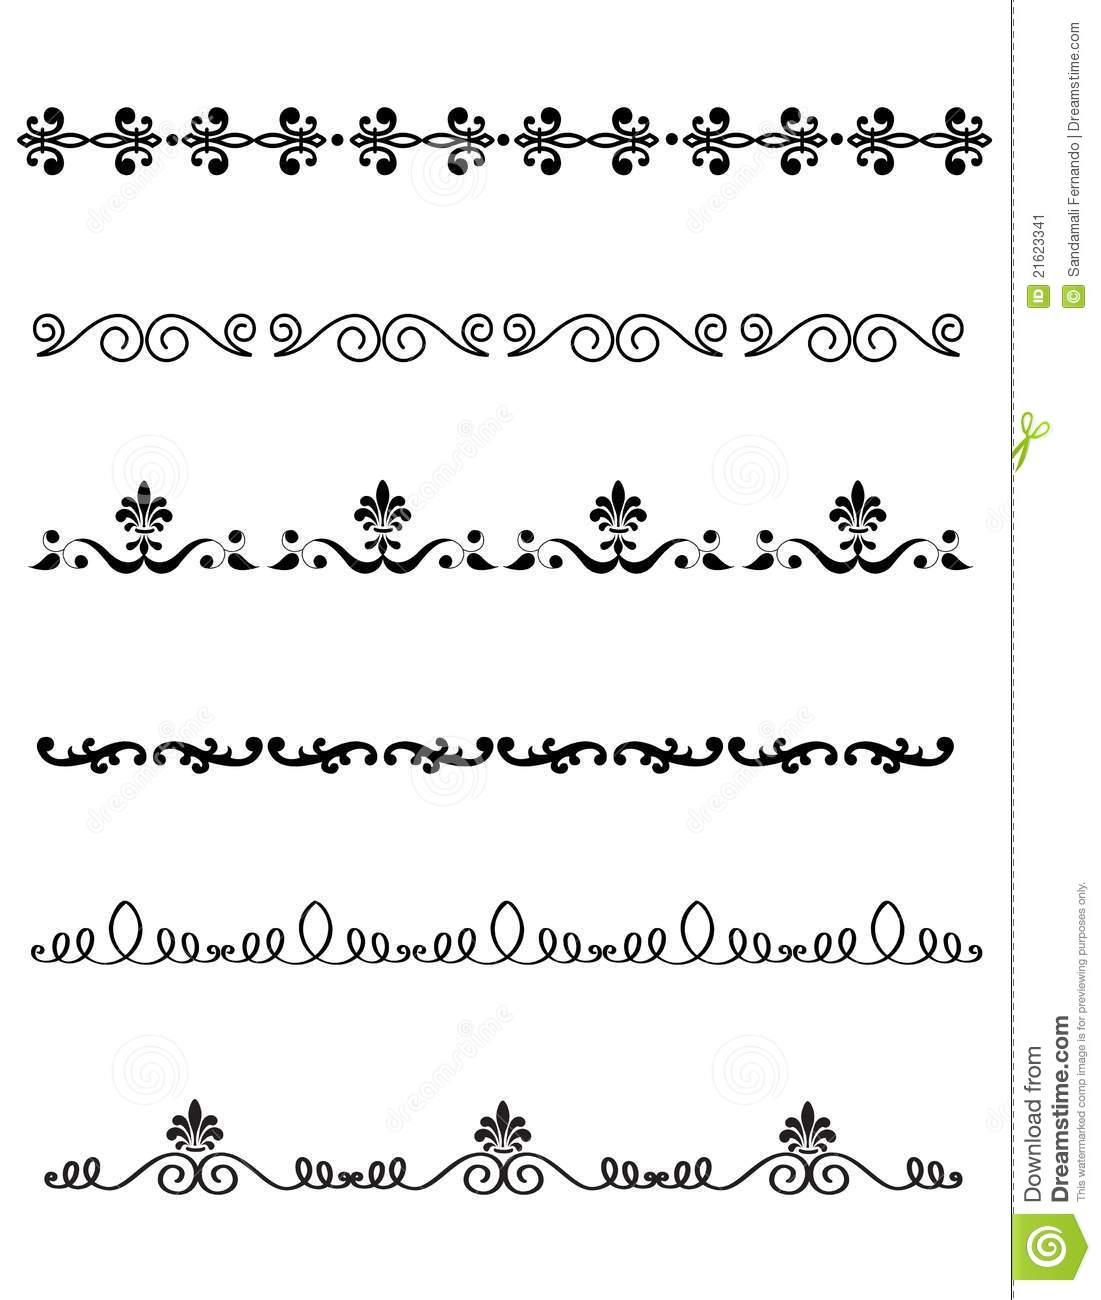 Decorative divider stock vector. Illustration of clipart.